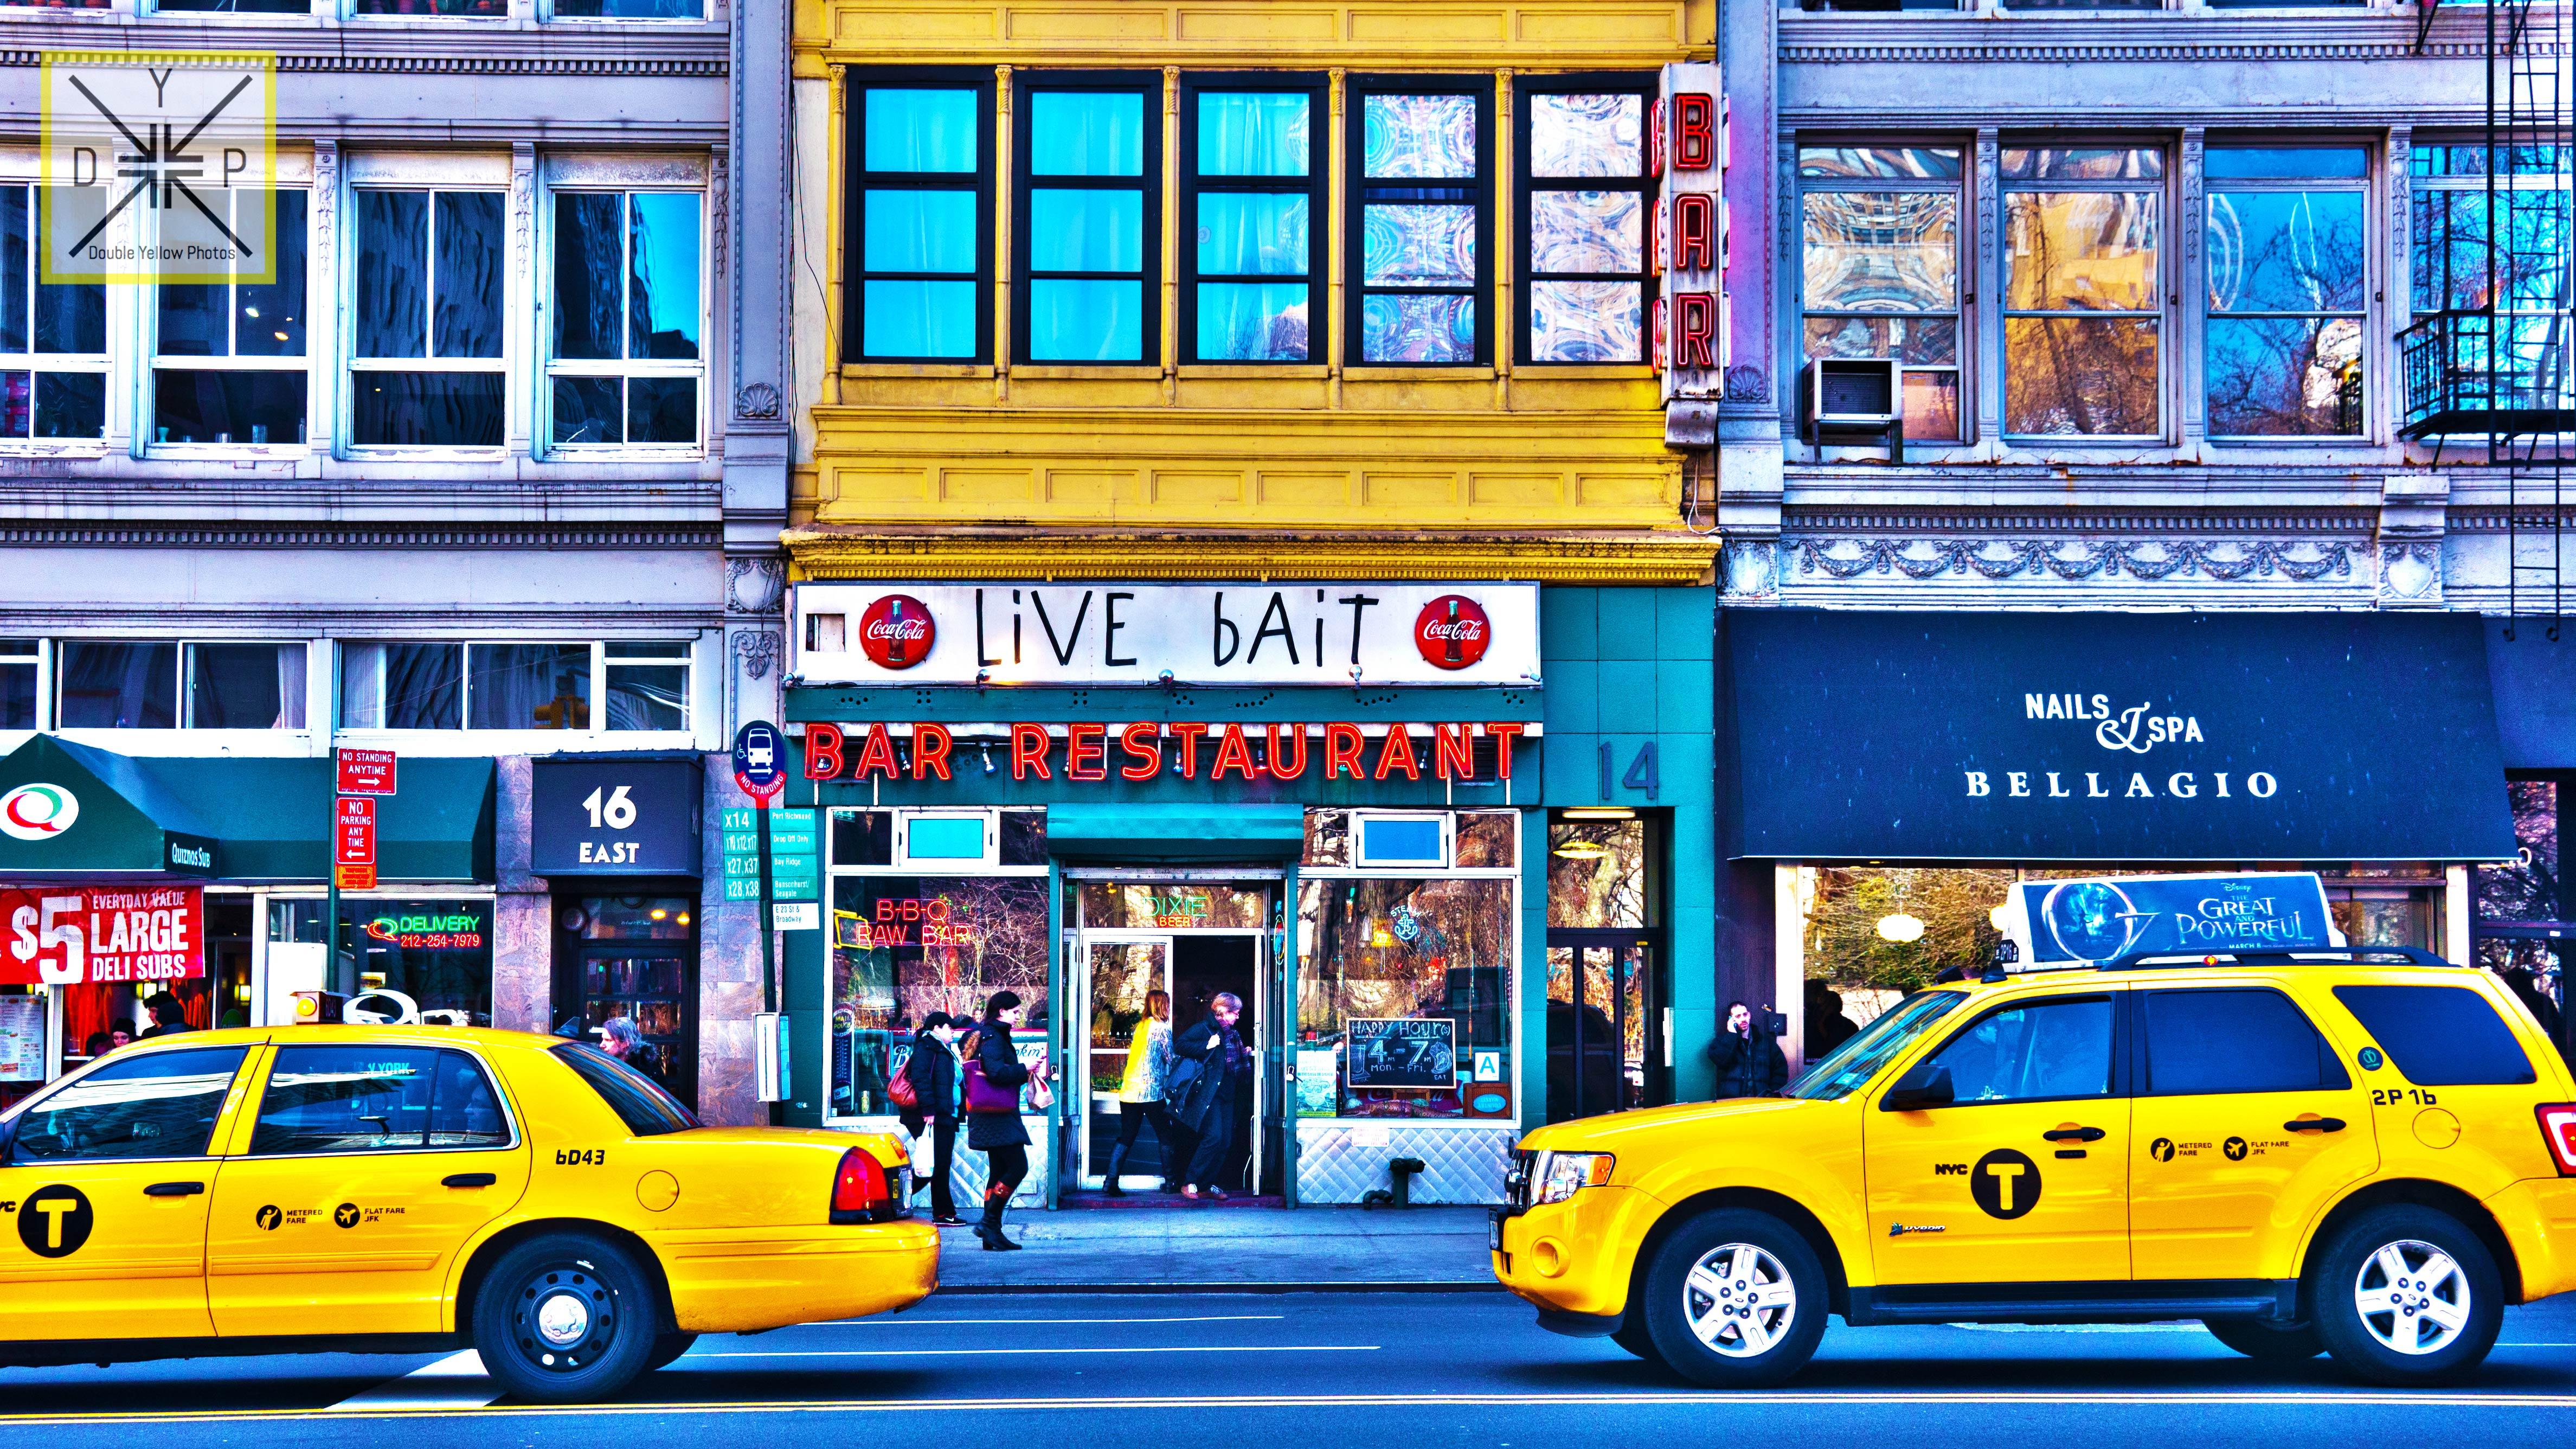 Live Bait - NYC